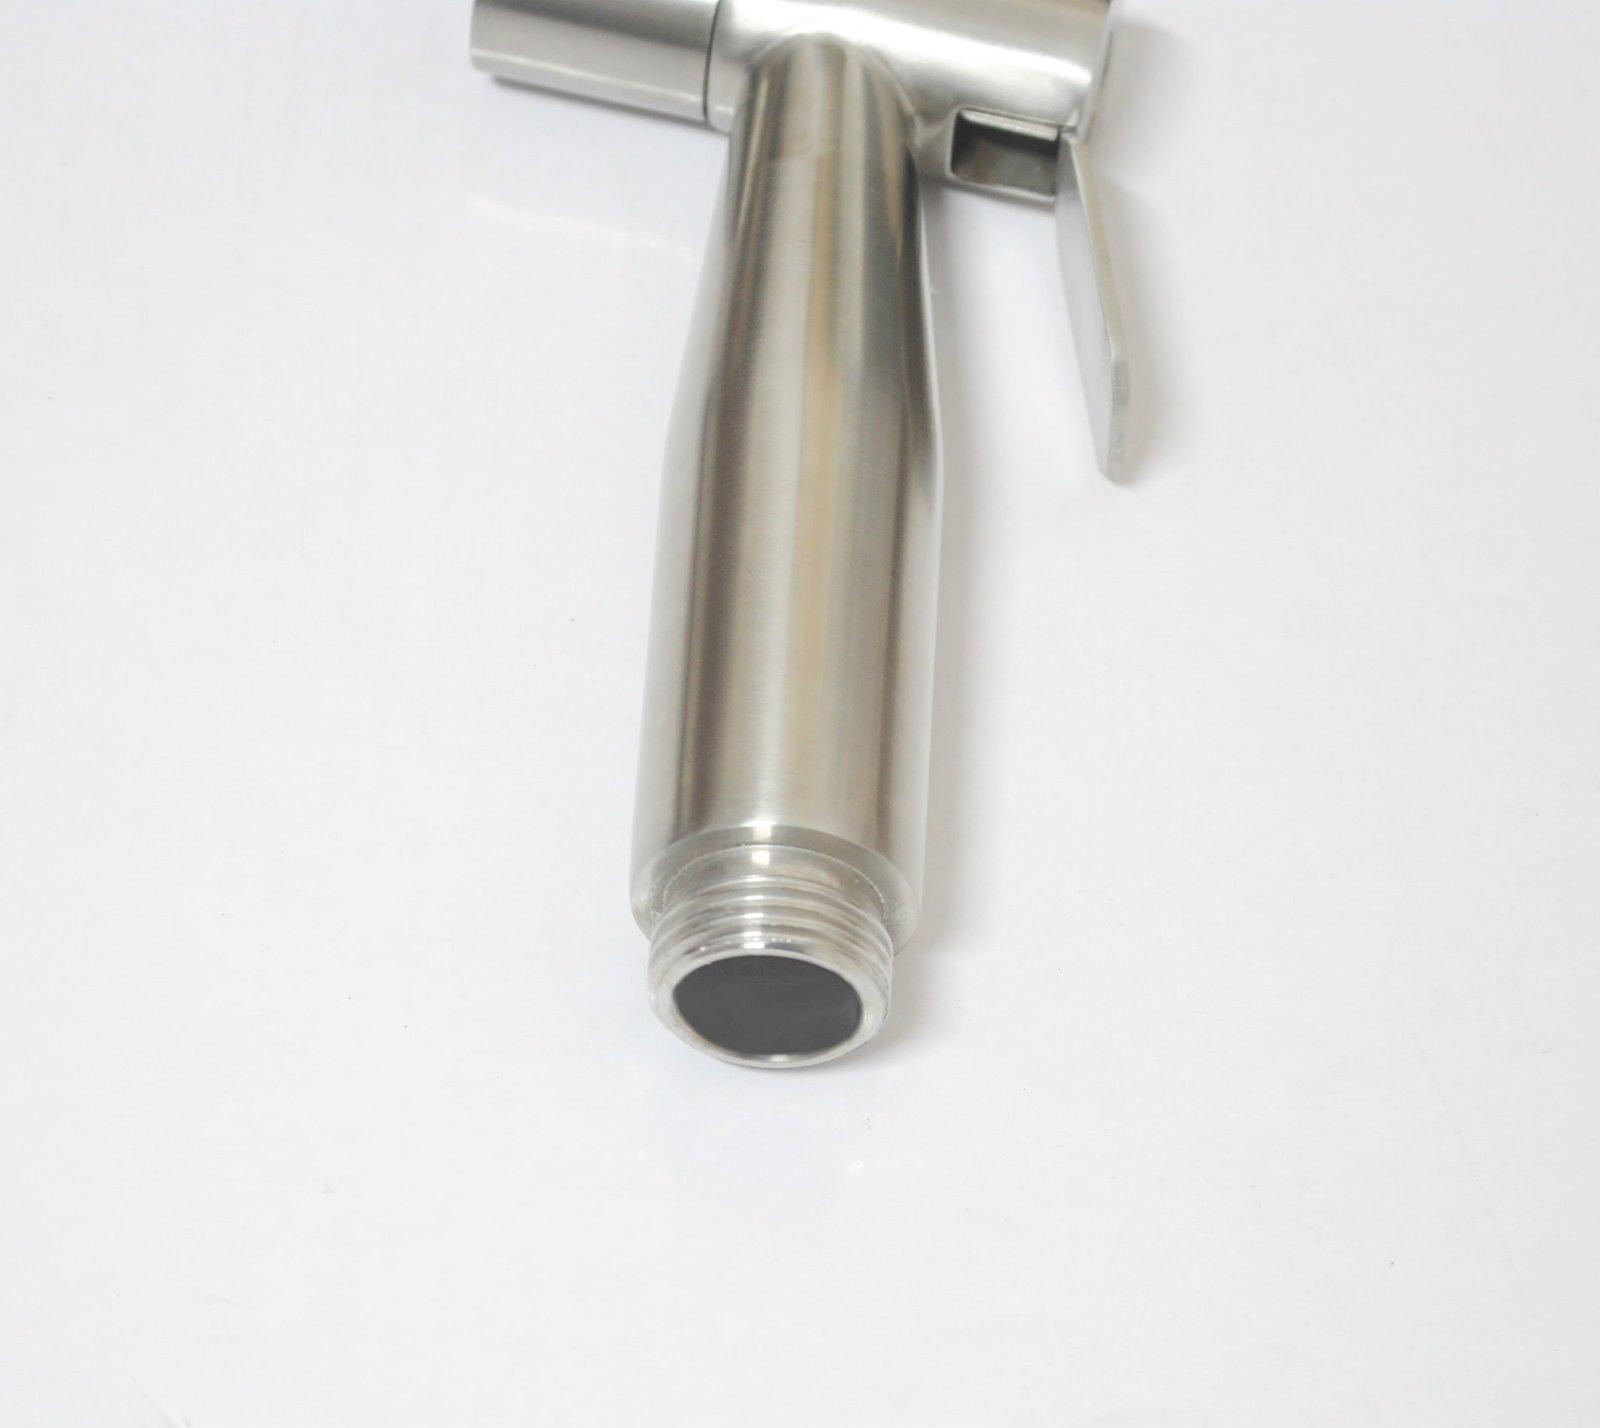 Ownace Bathroom Bidet Sprayer Head Only, Stainless Steel Brushed Nickel Diaper Sprayer